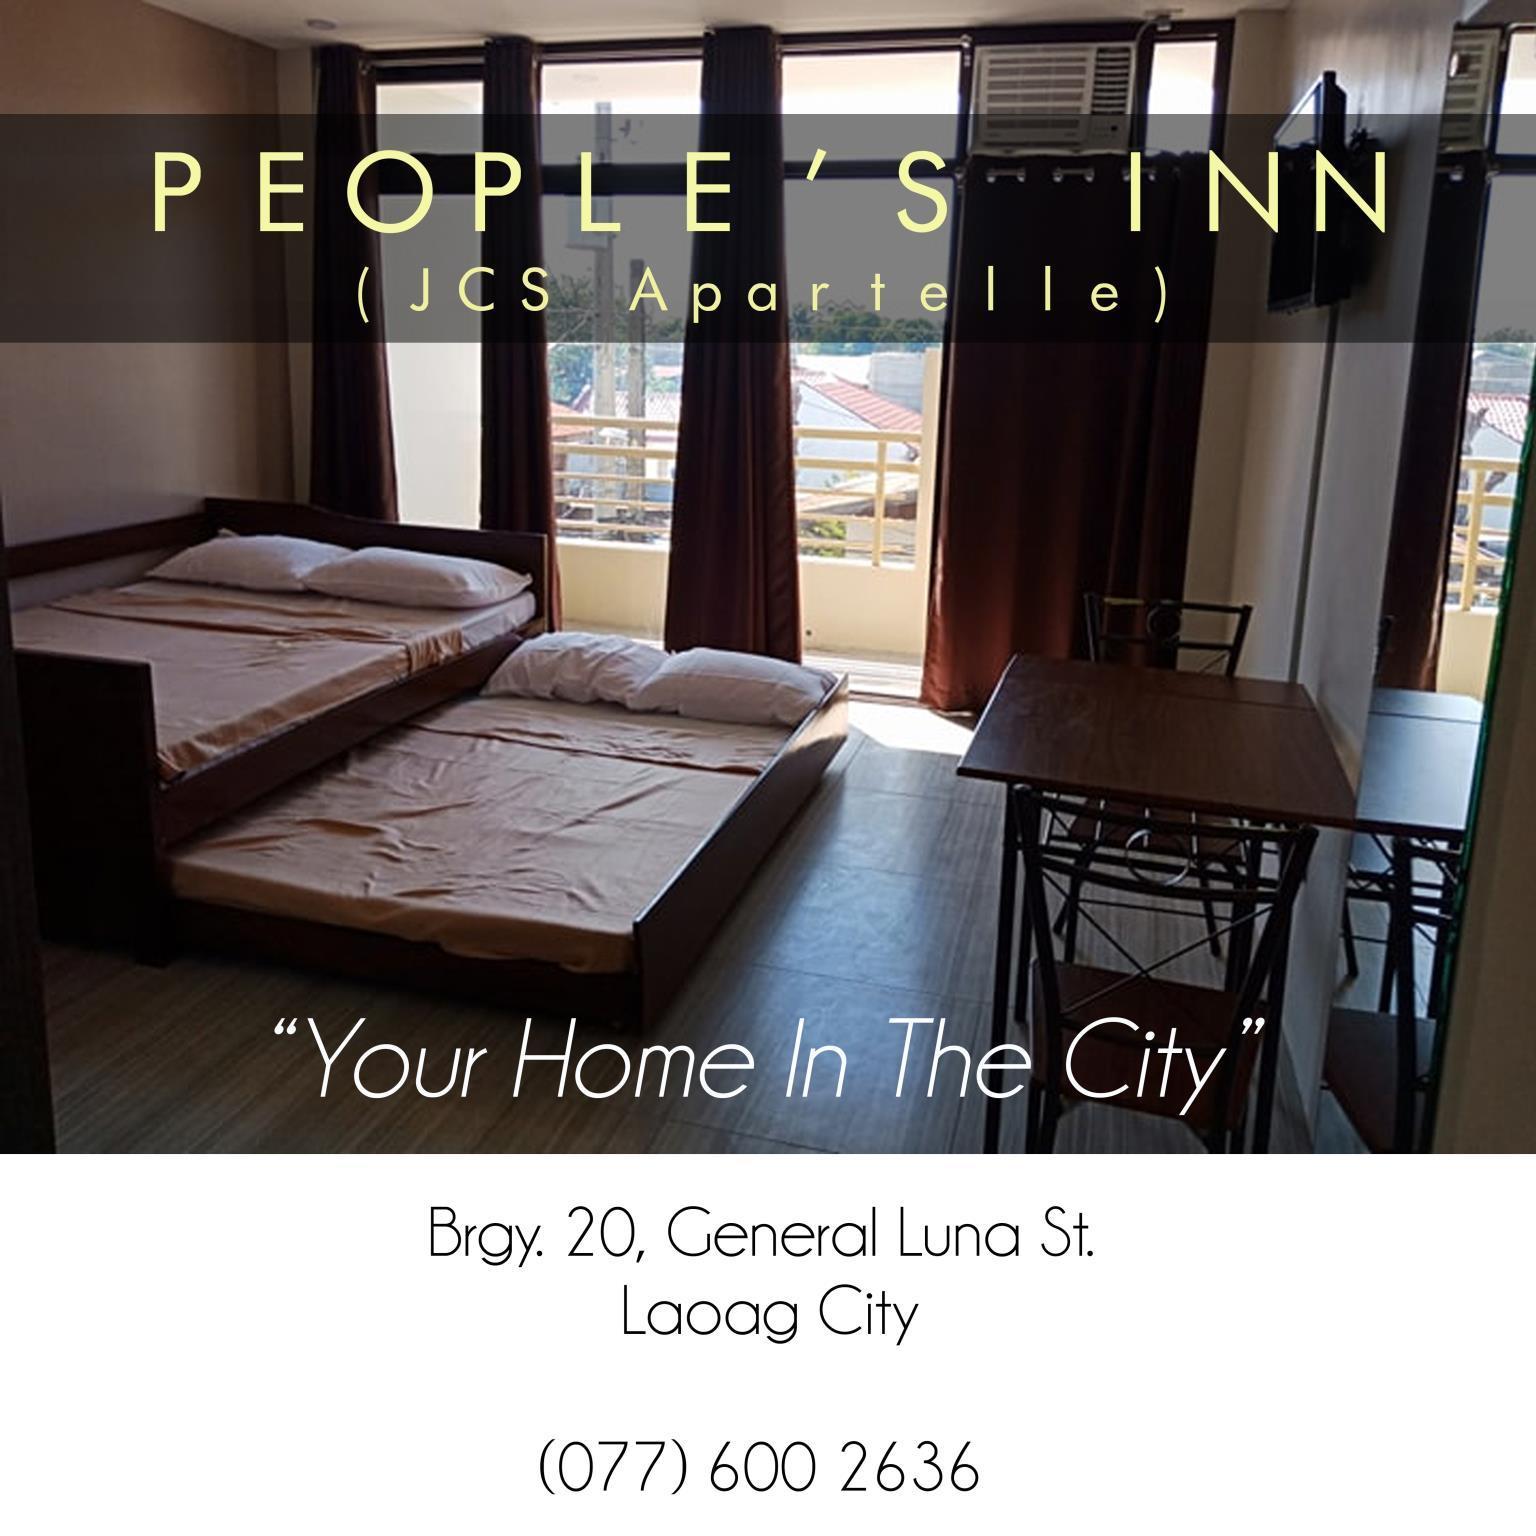 People's Inn